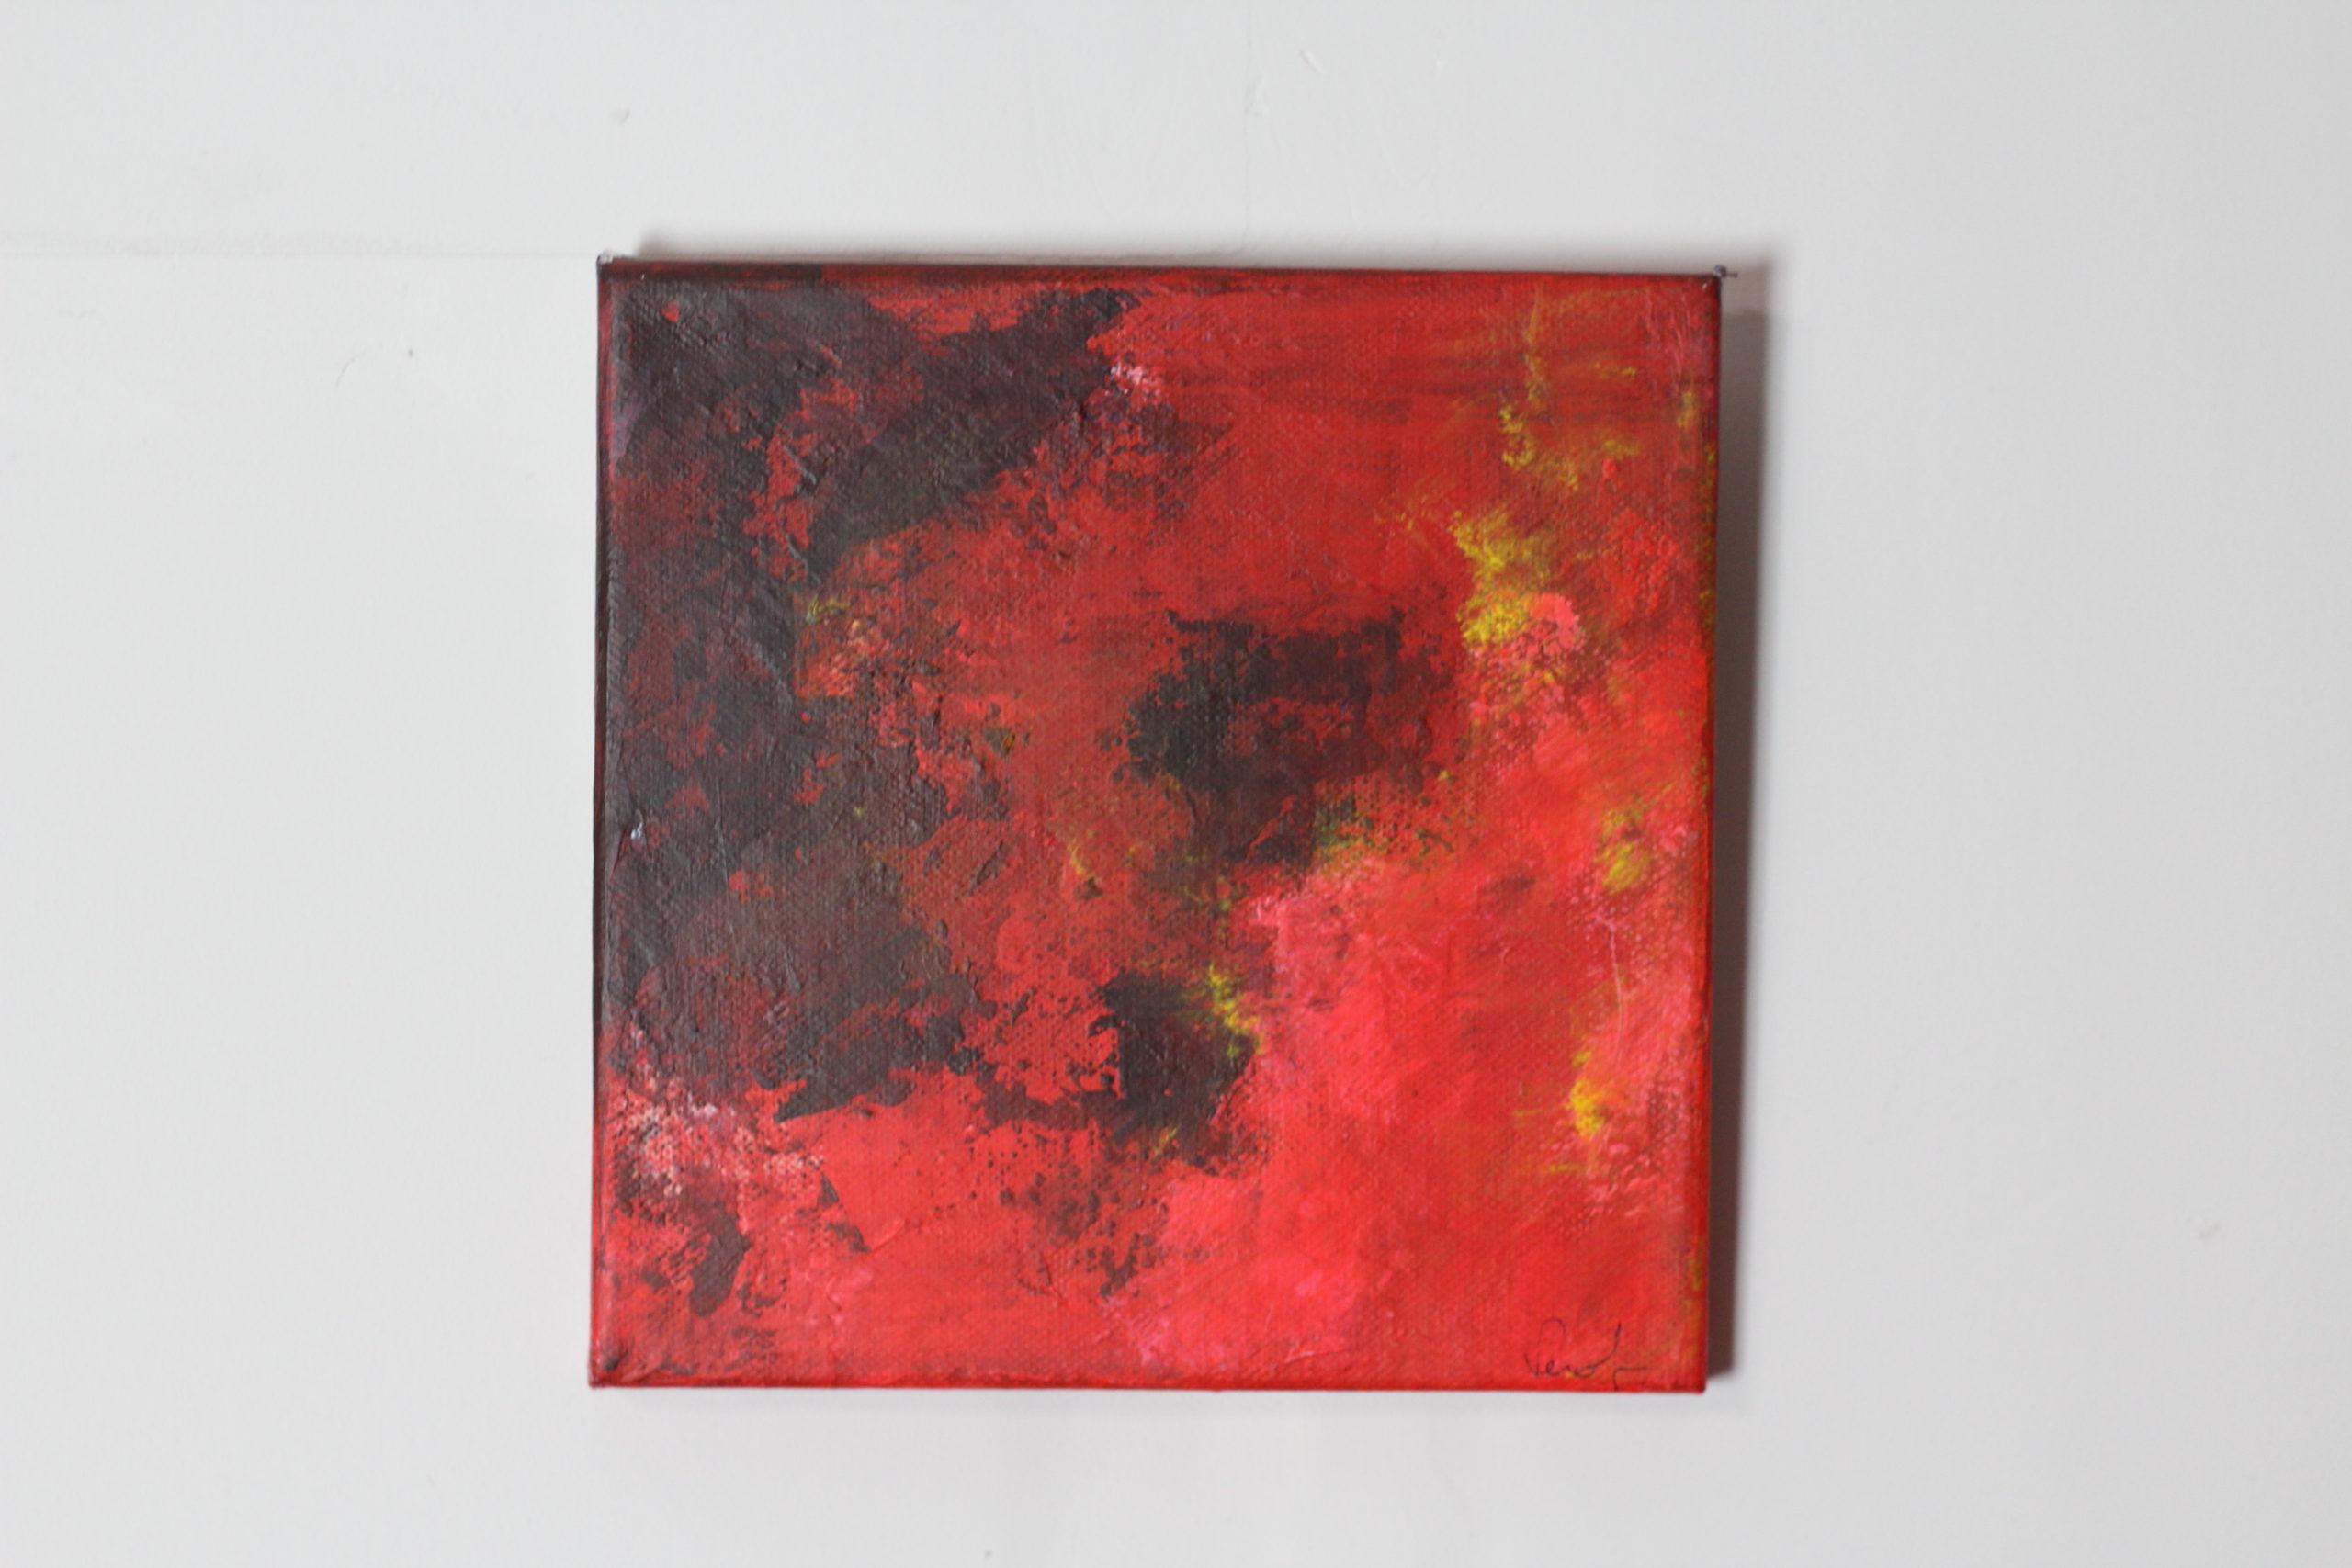 Peinture : Nature 3 20x20 (Véronique Fuchs-Sublon)